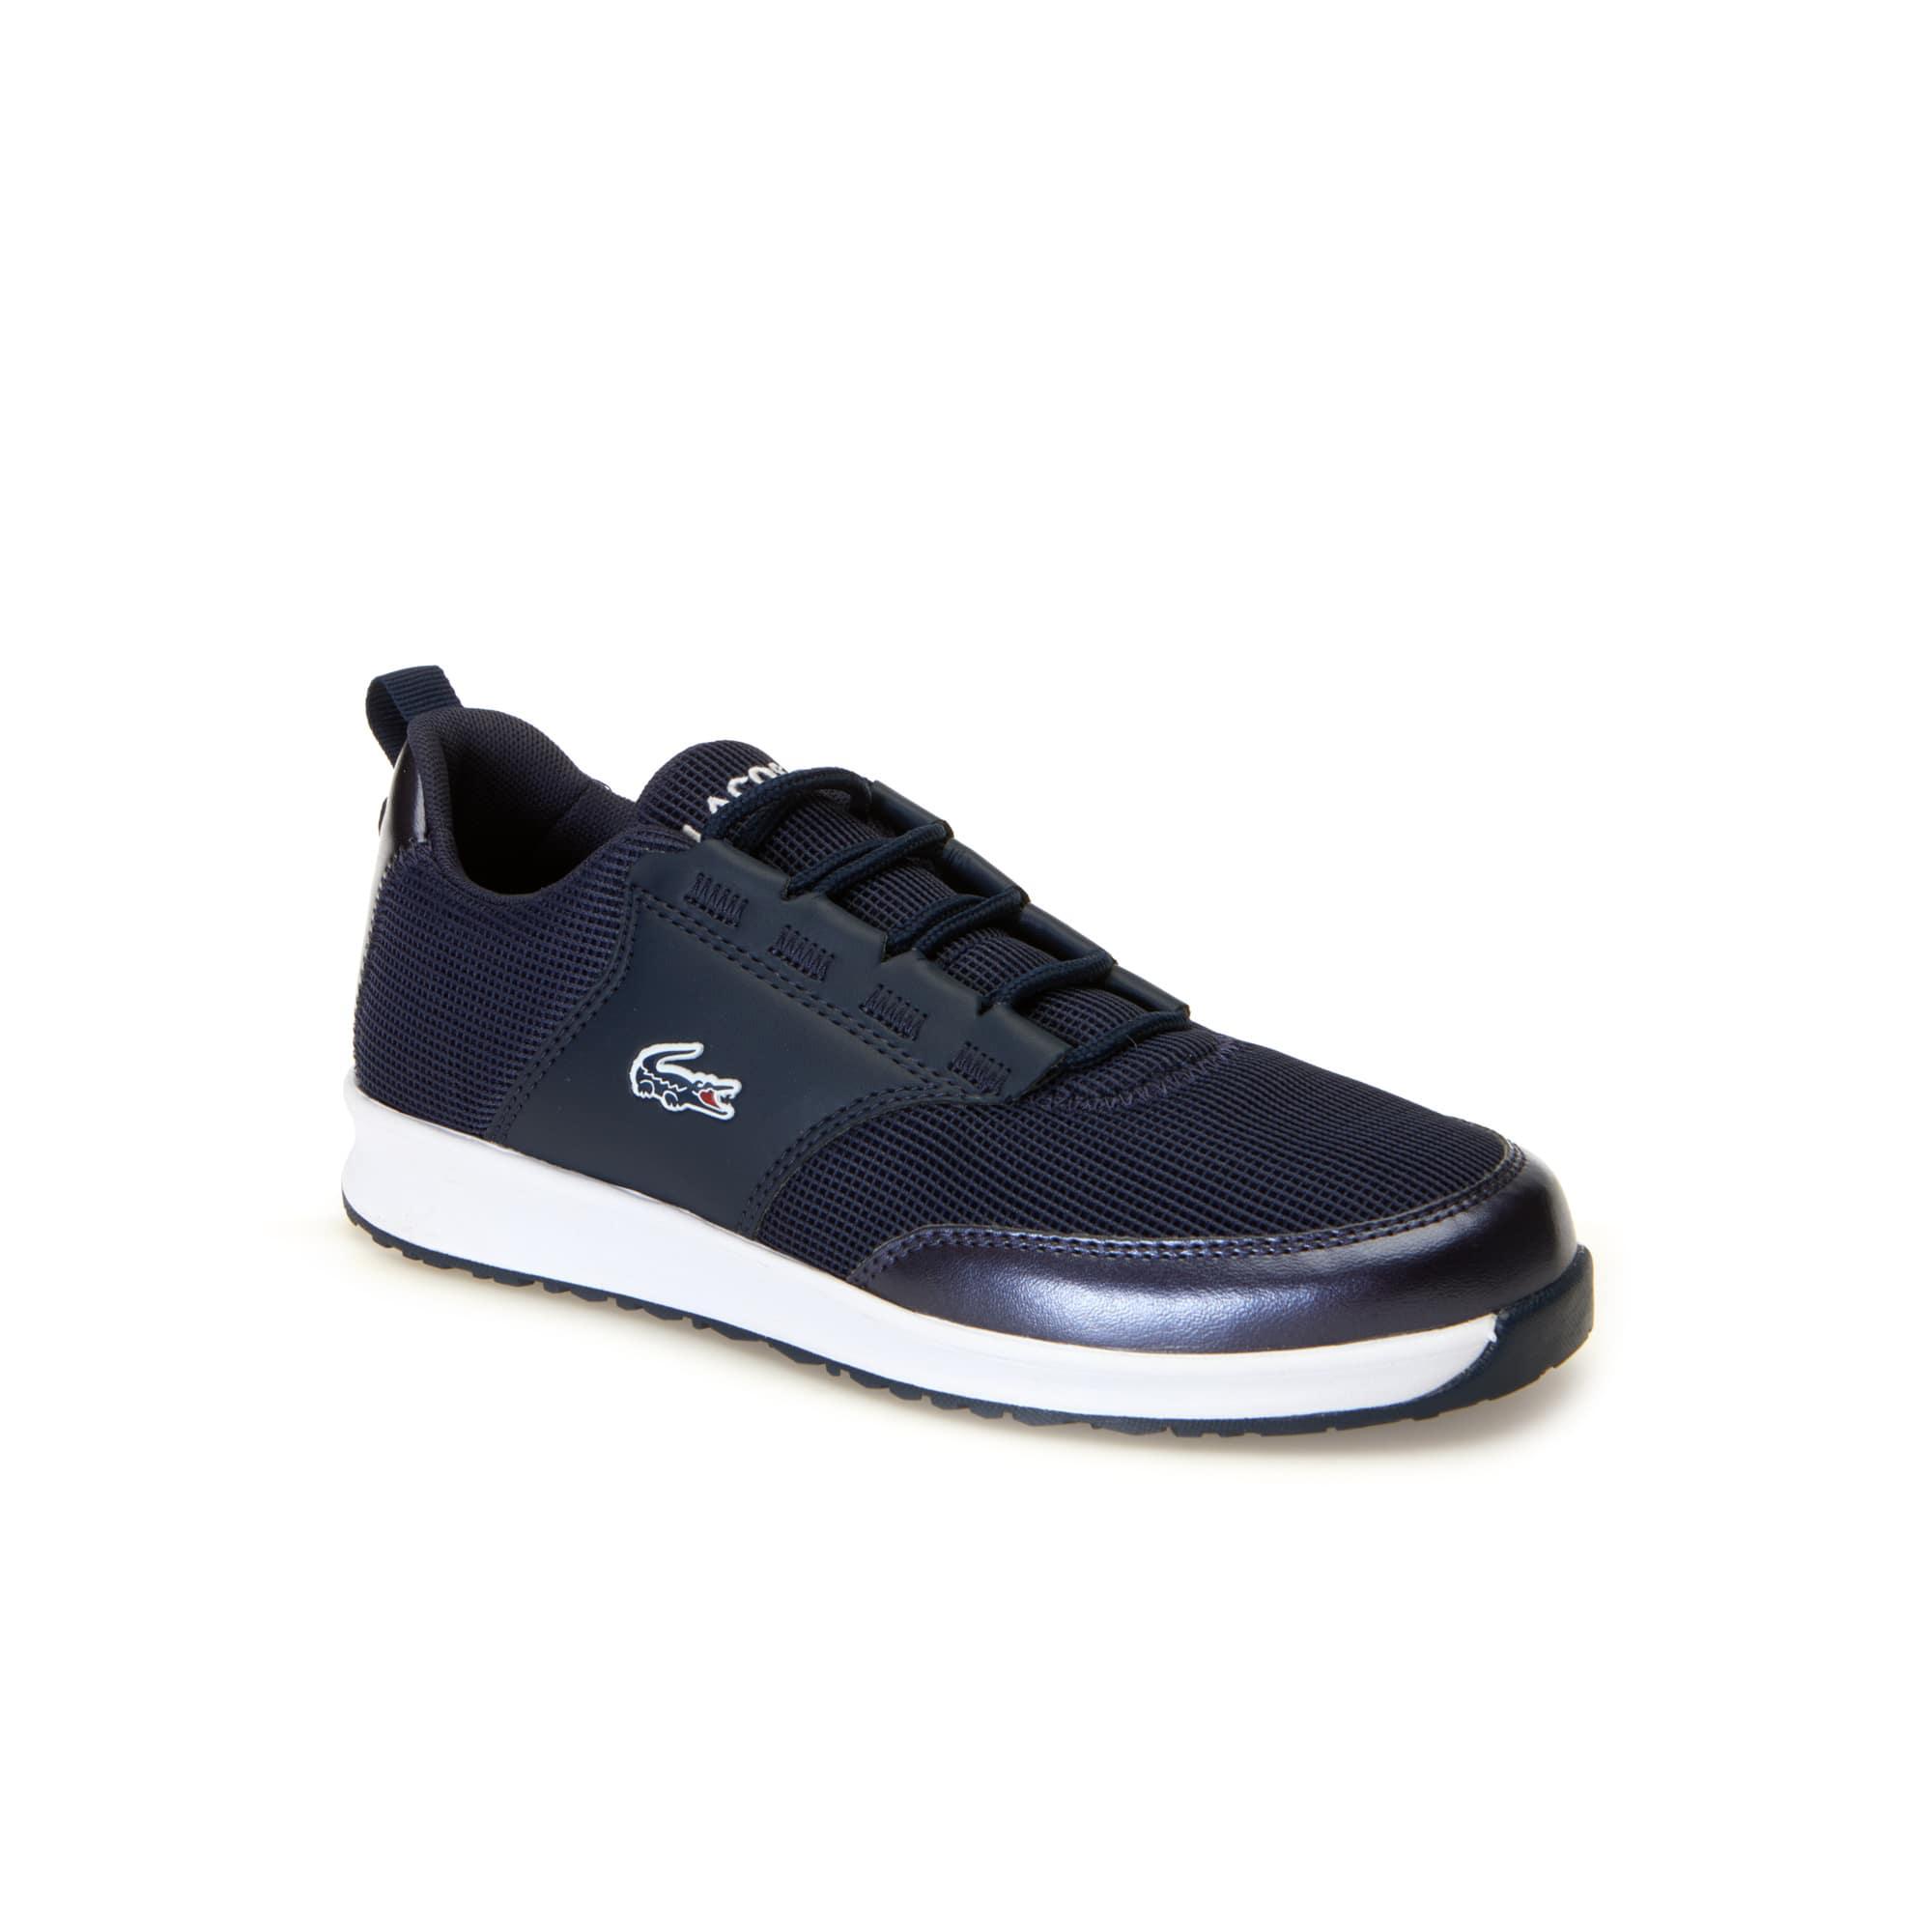 82cde553050 Sneakers L.ight ado couleur métallique